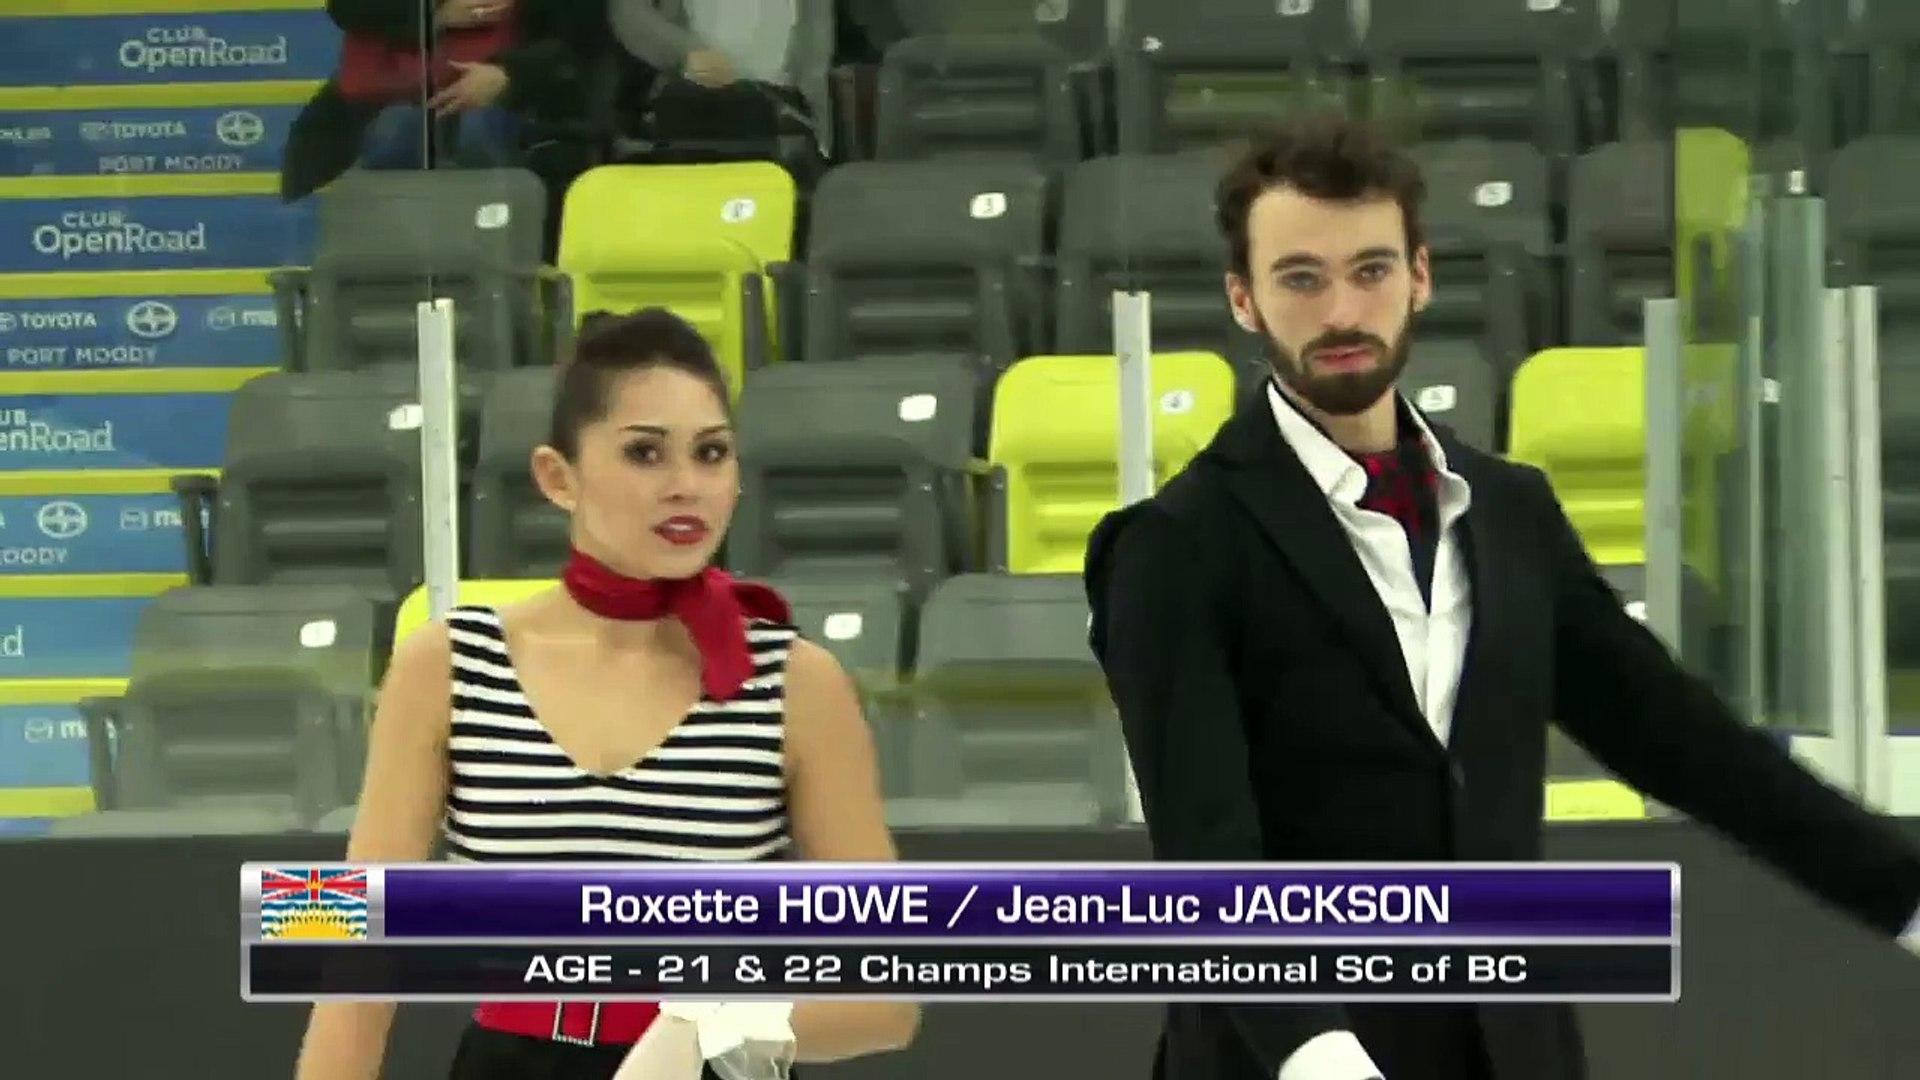 Roxette Howe/Jean-Luc Jackson - Senior Short Dance - 2016 Skate Canada BC/YK Sectional Championships